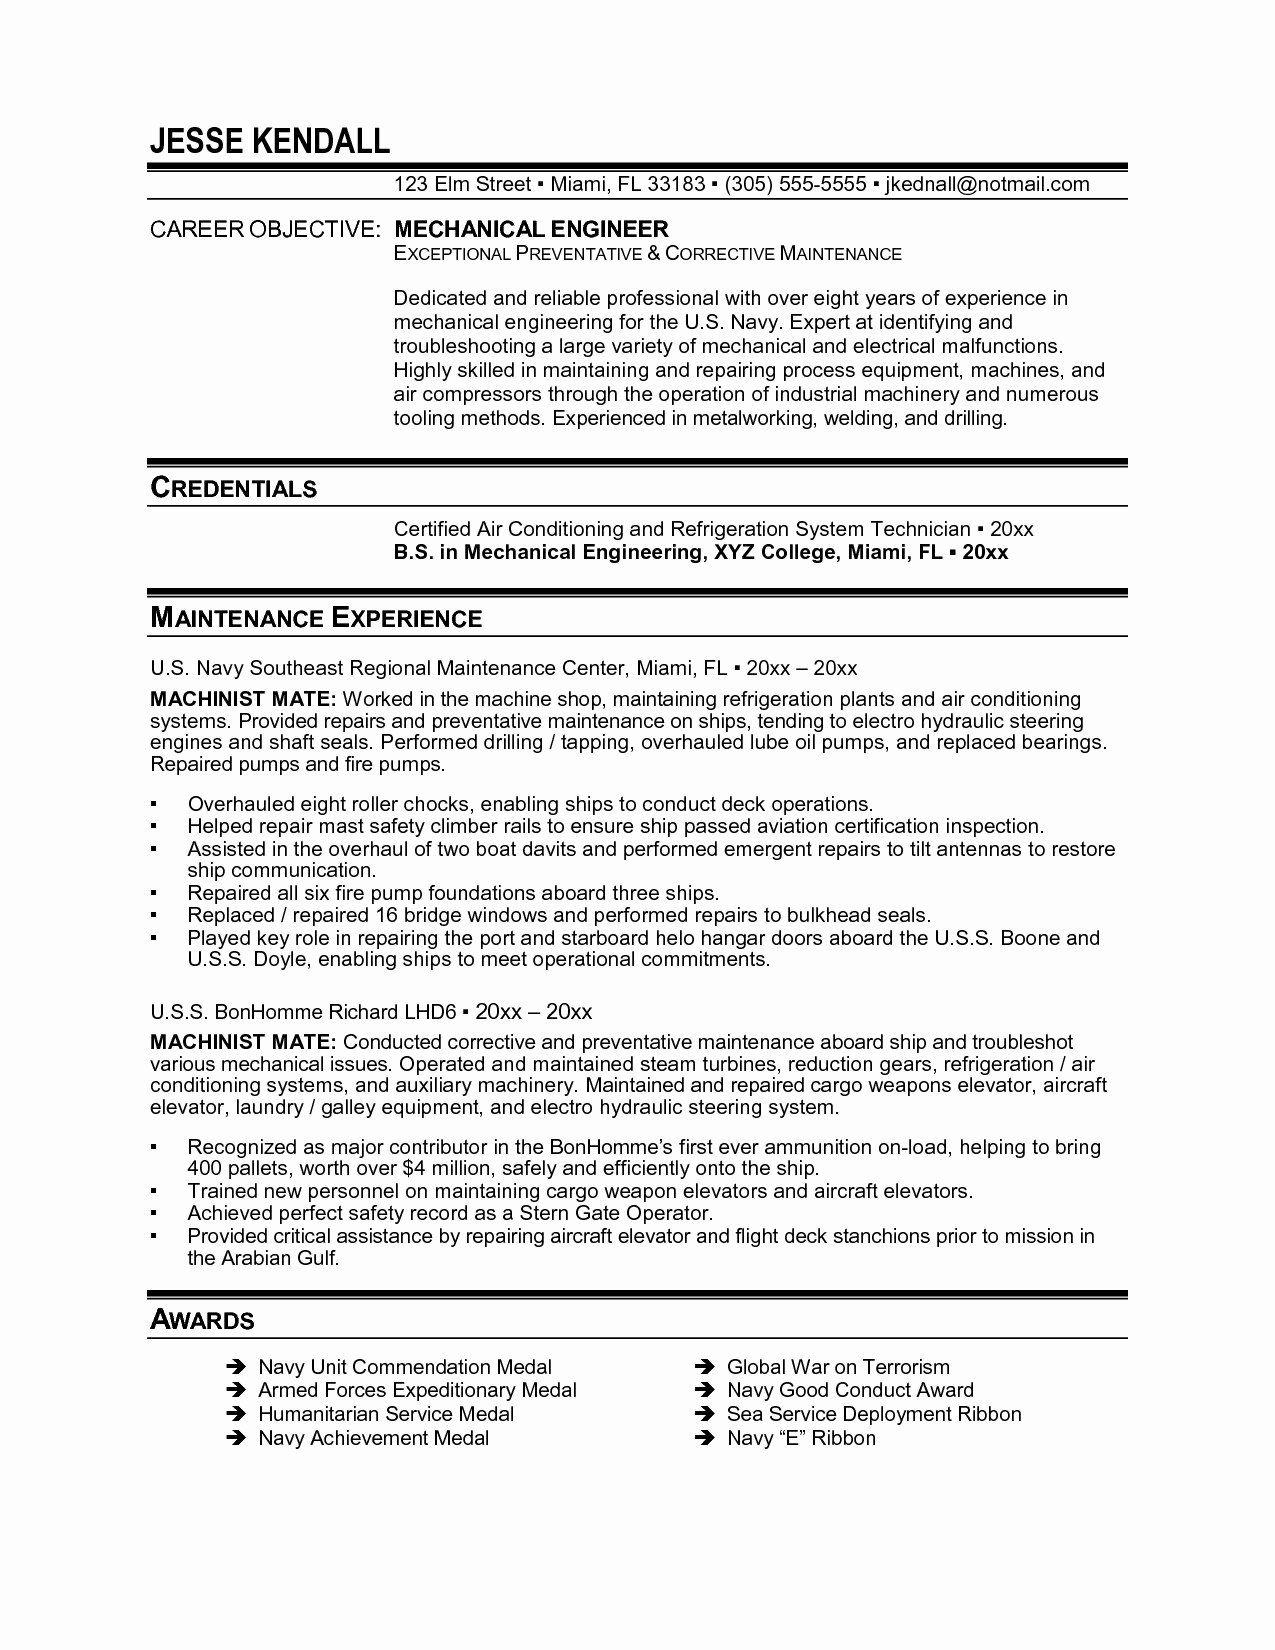 20 Critical Care Nursing Resume Colimatrespuntocero Com In 2021 Engineering Resume Job Resume Samples Mechanical Engineer Resume